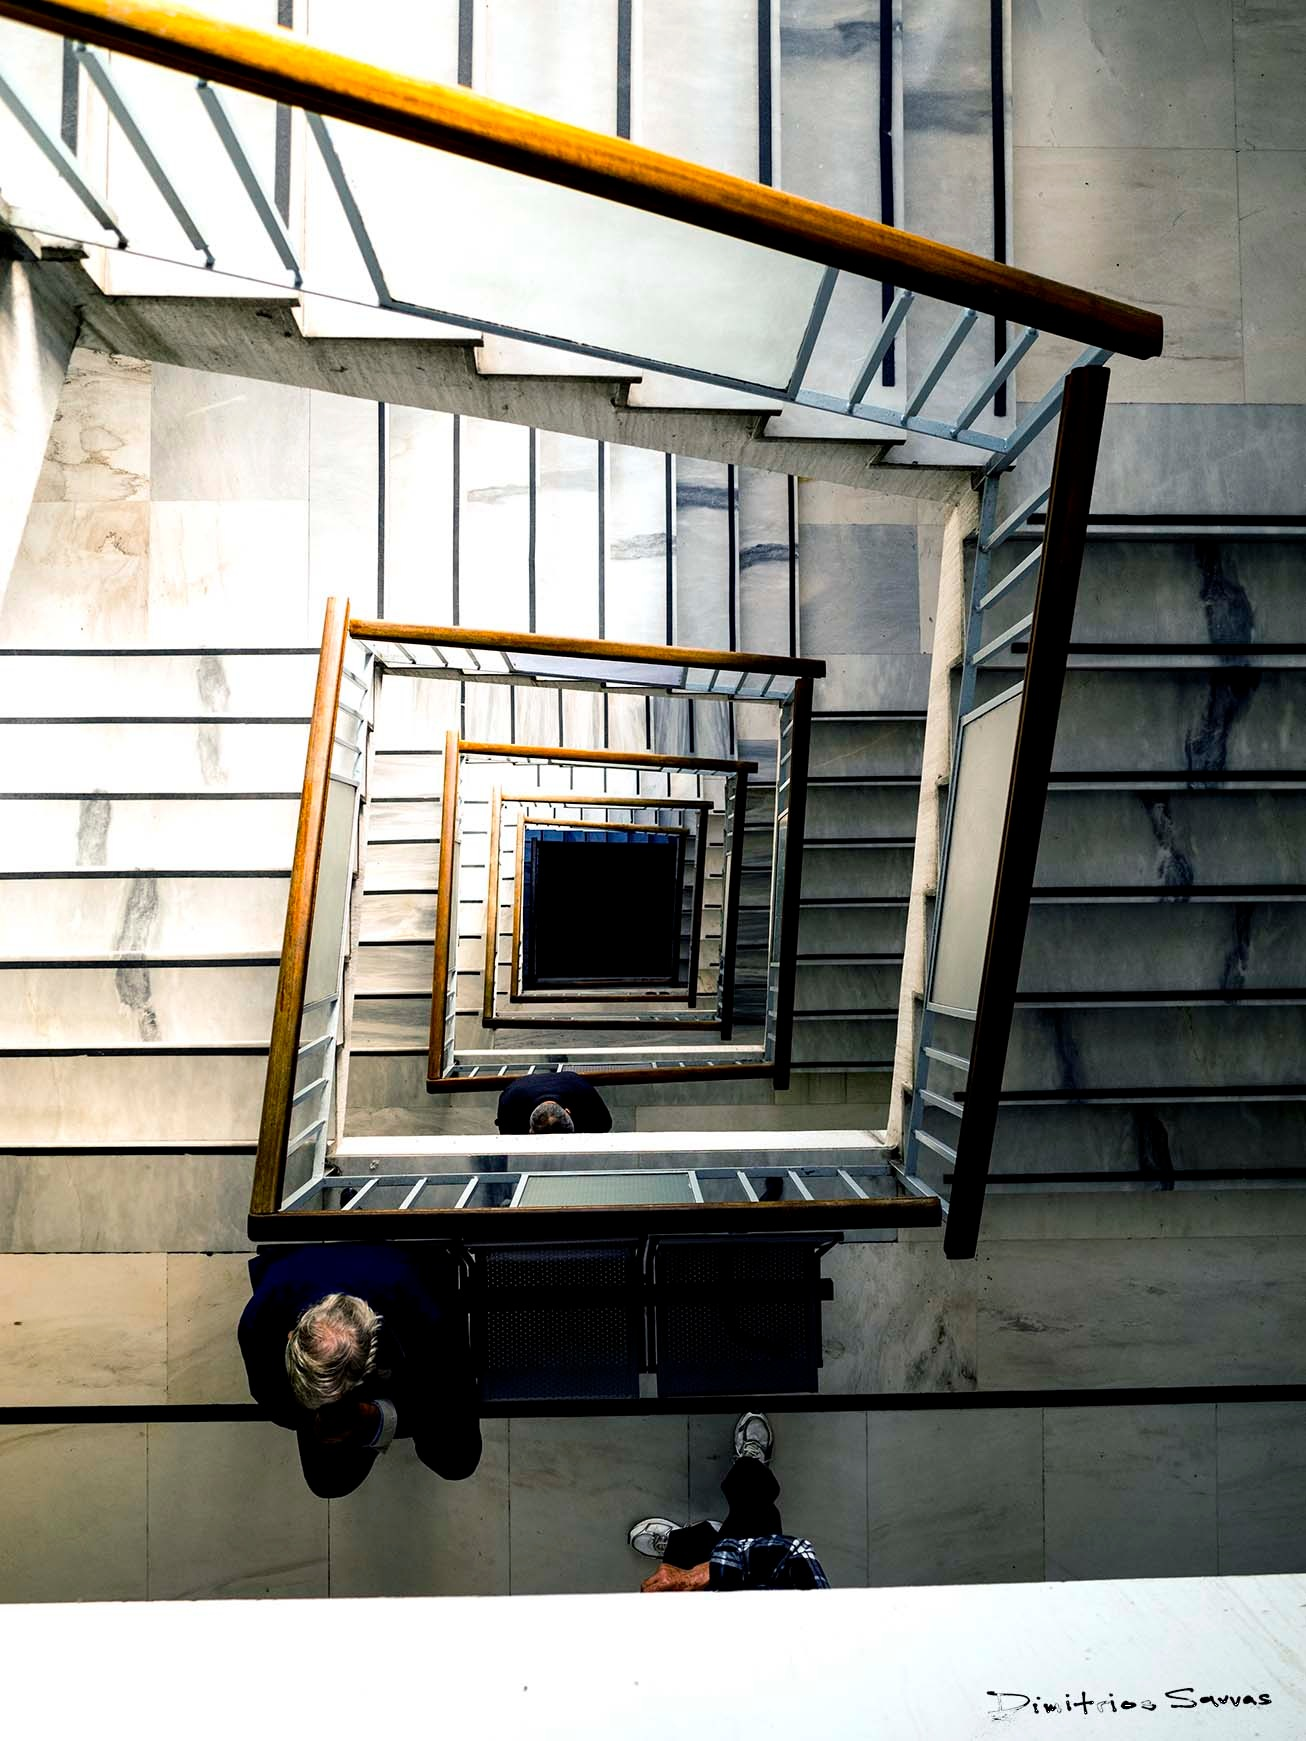 The Ippocrateon Hospital Stairwell by dimitrissavvas